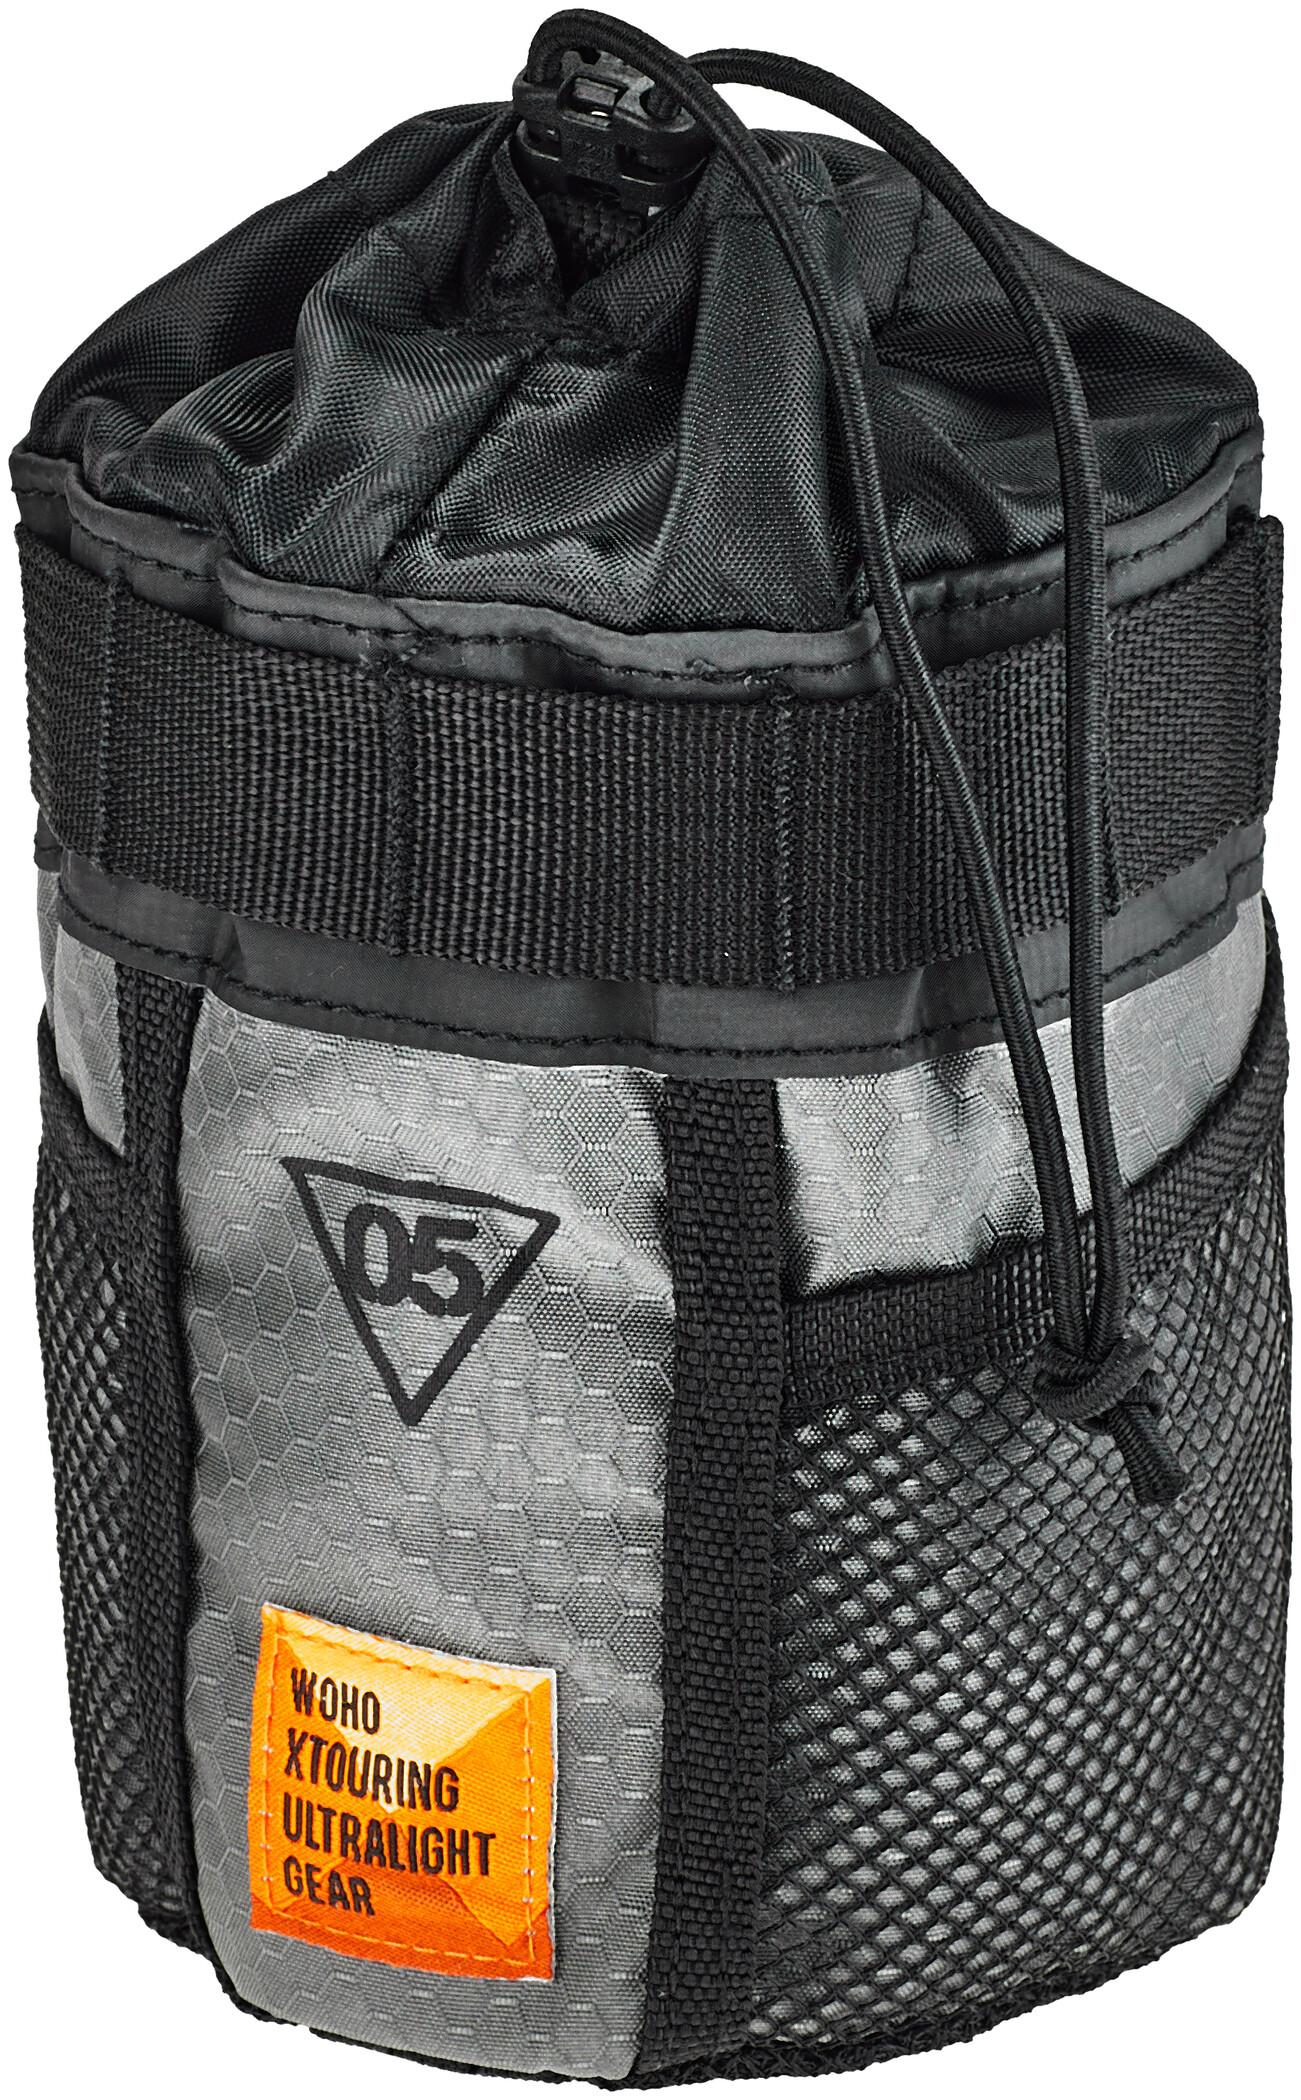 WOHO X-Touring Flaskeholder, honeycomb iron grey | Flaskeholdere